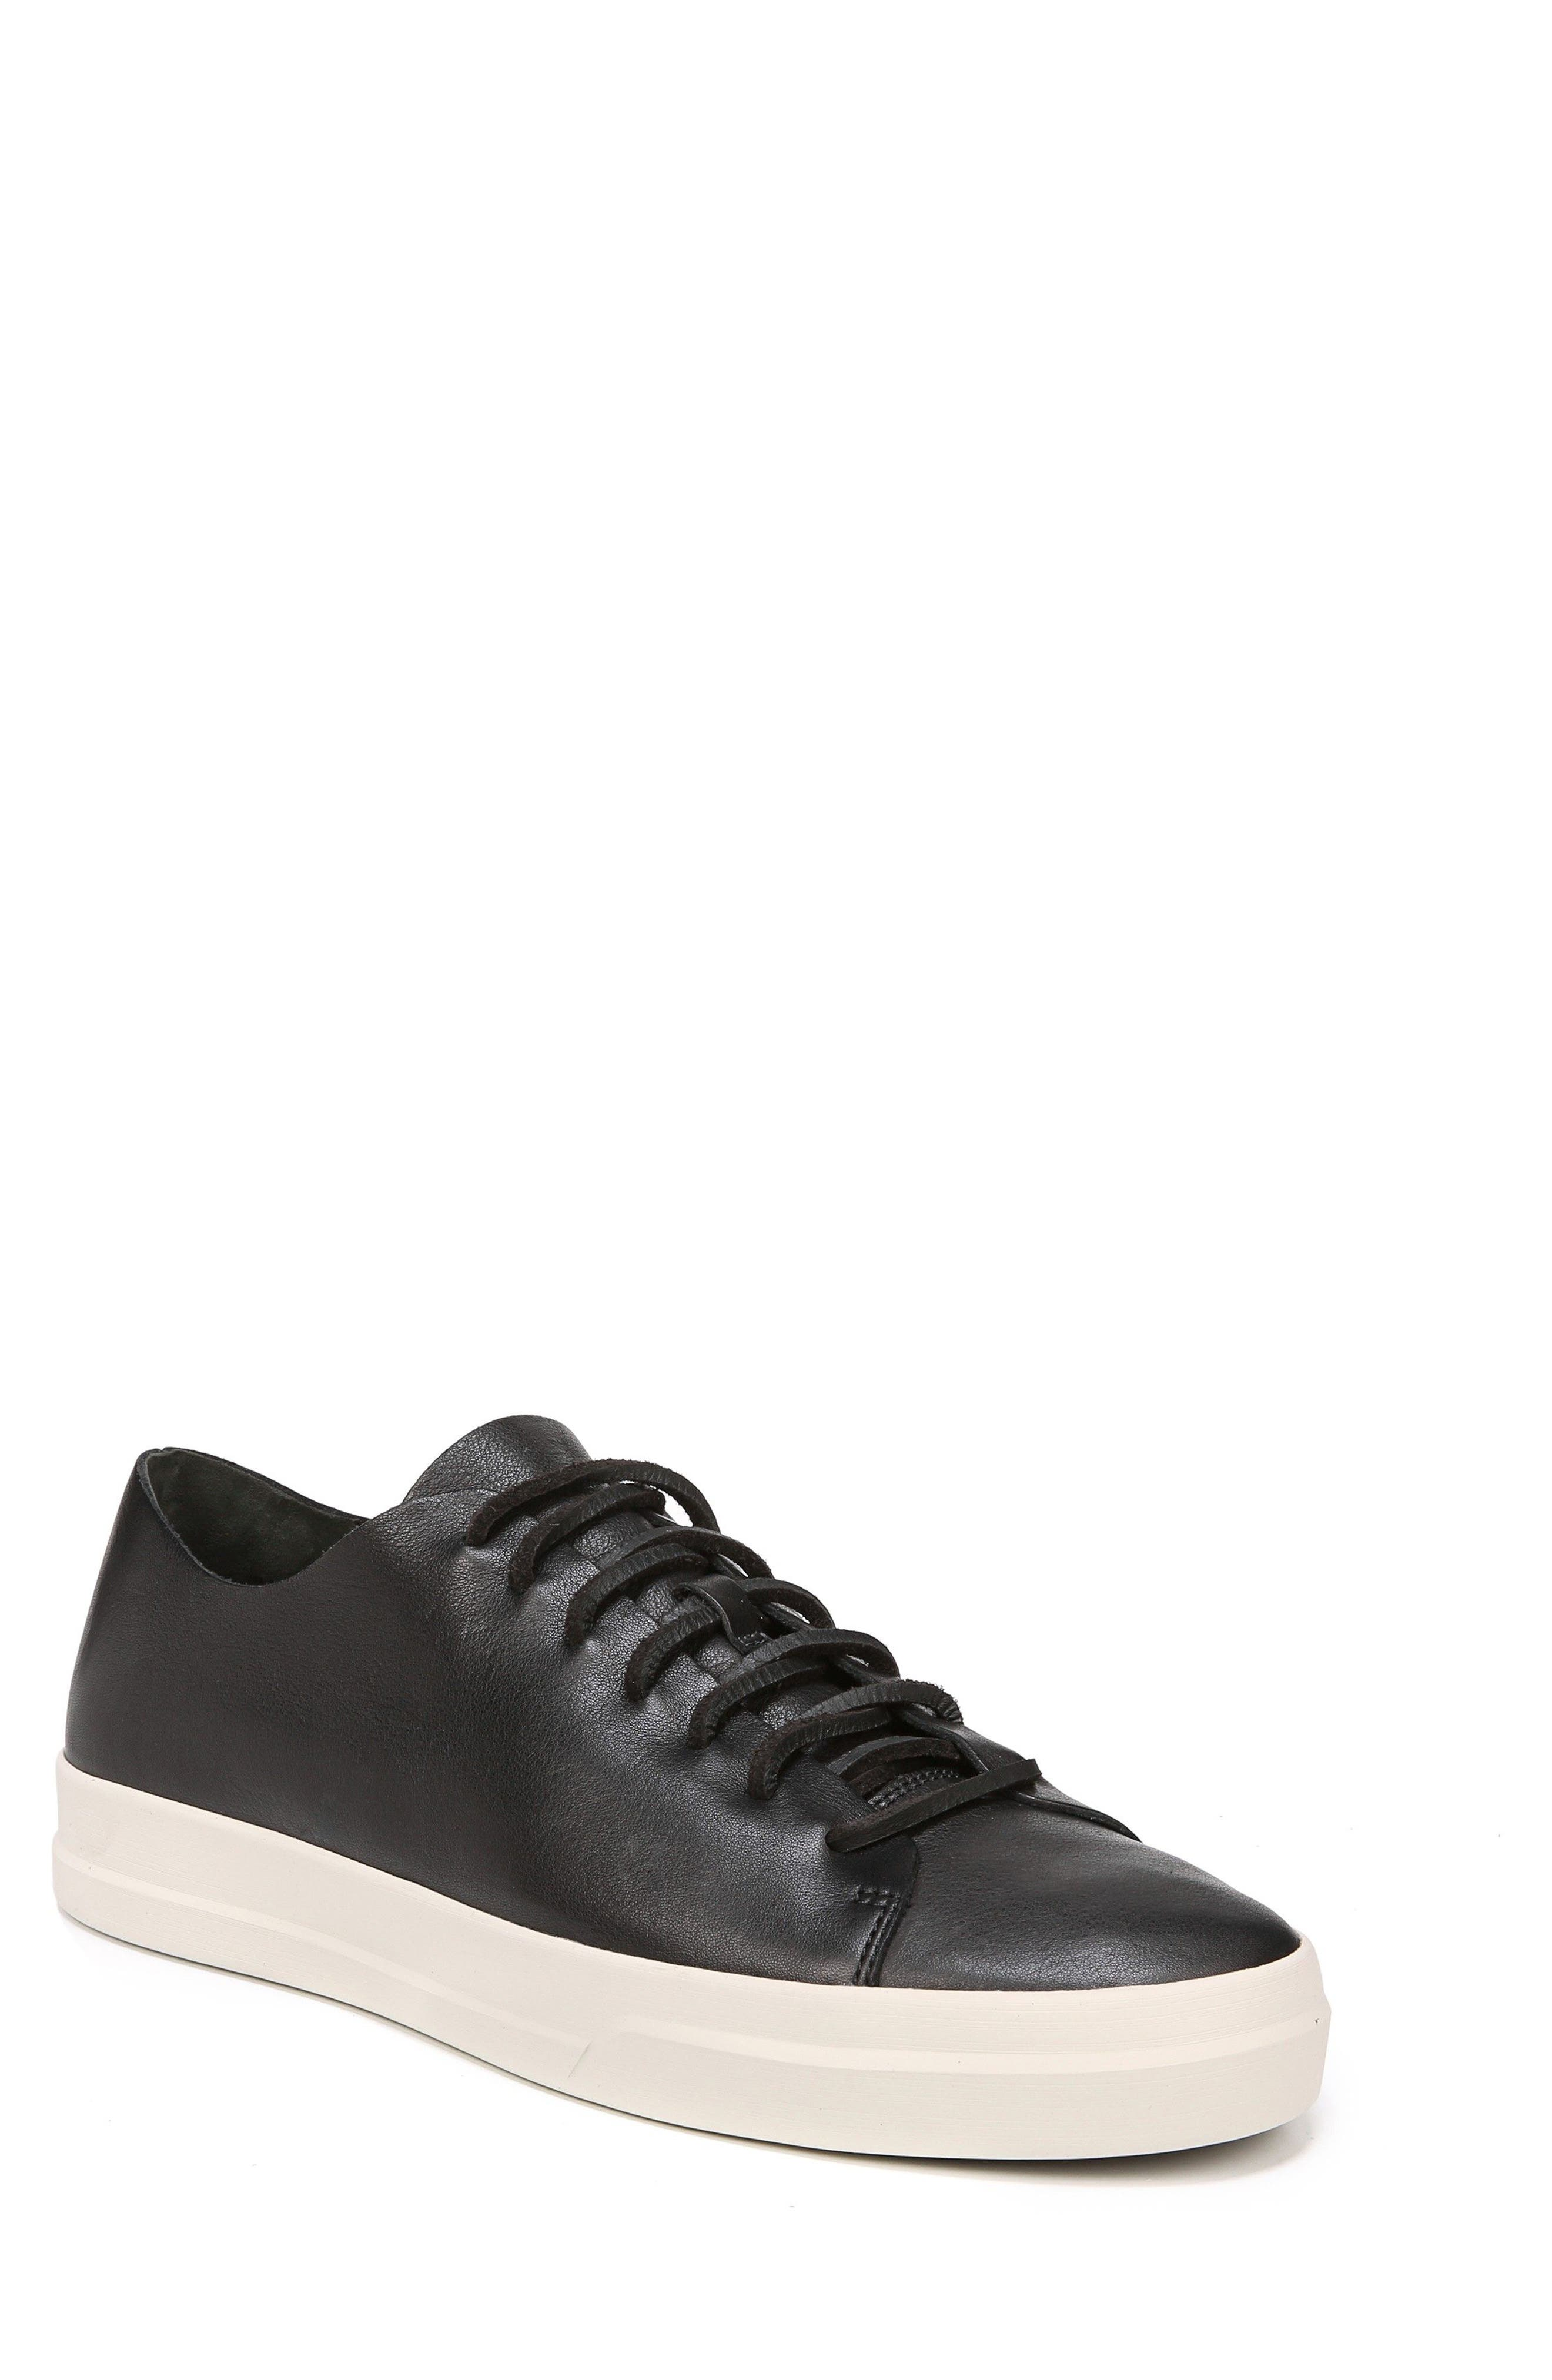 Vince Copeland Sneaker, Black